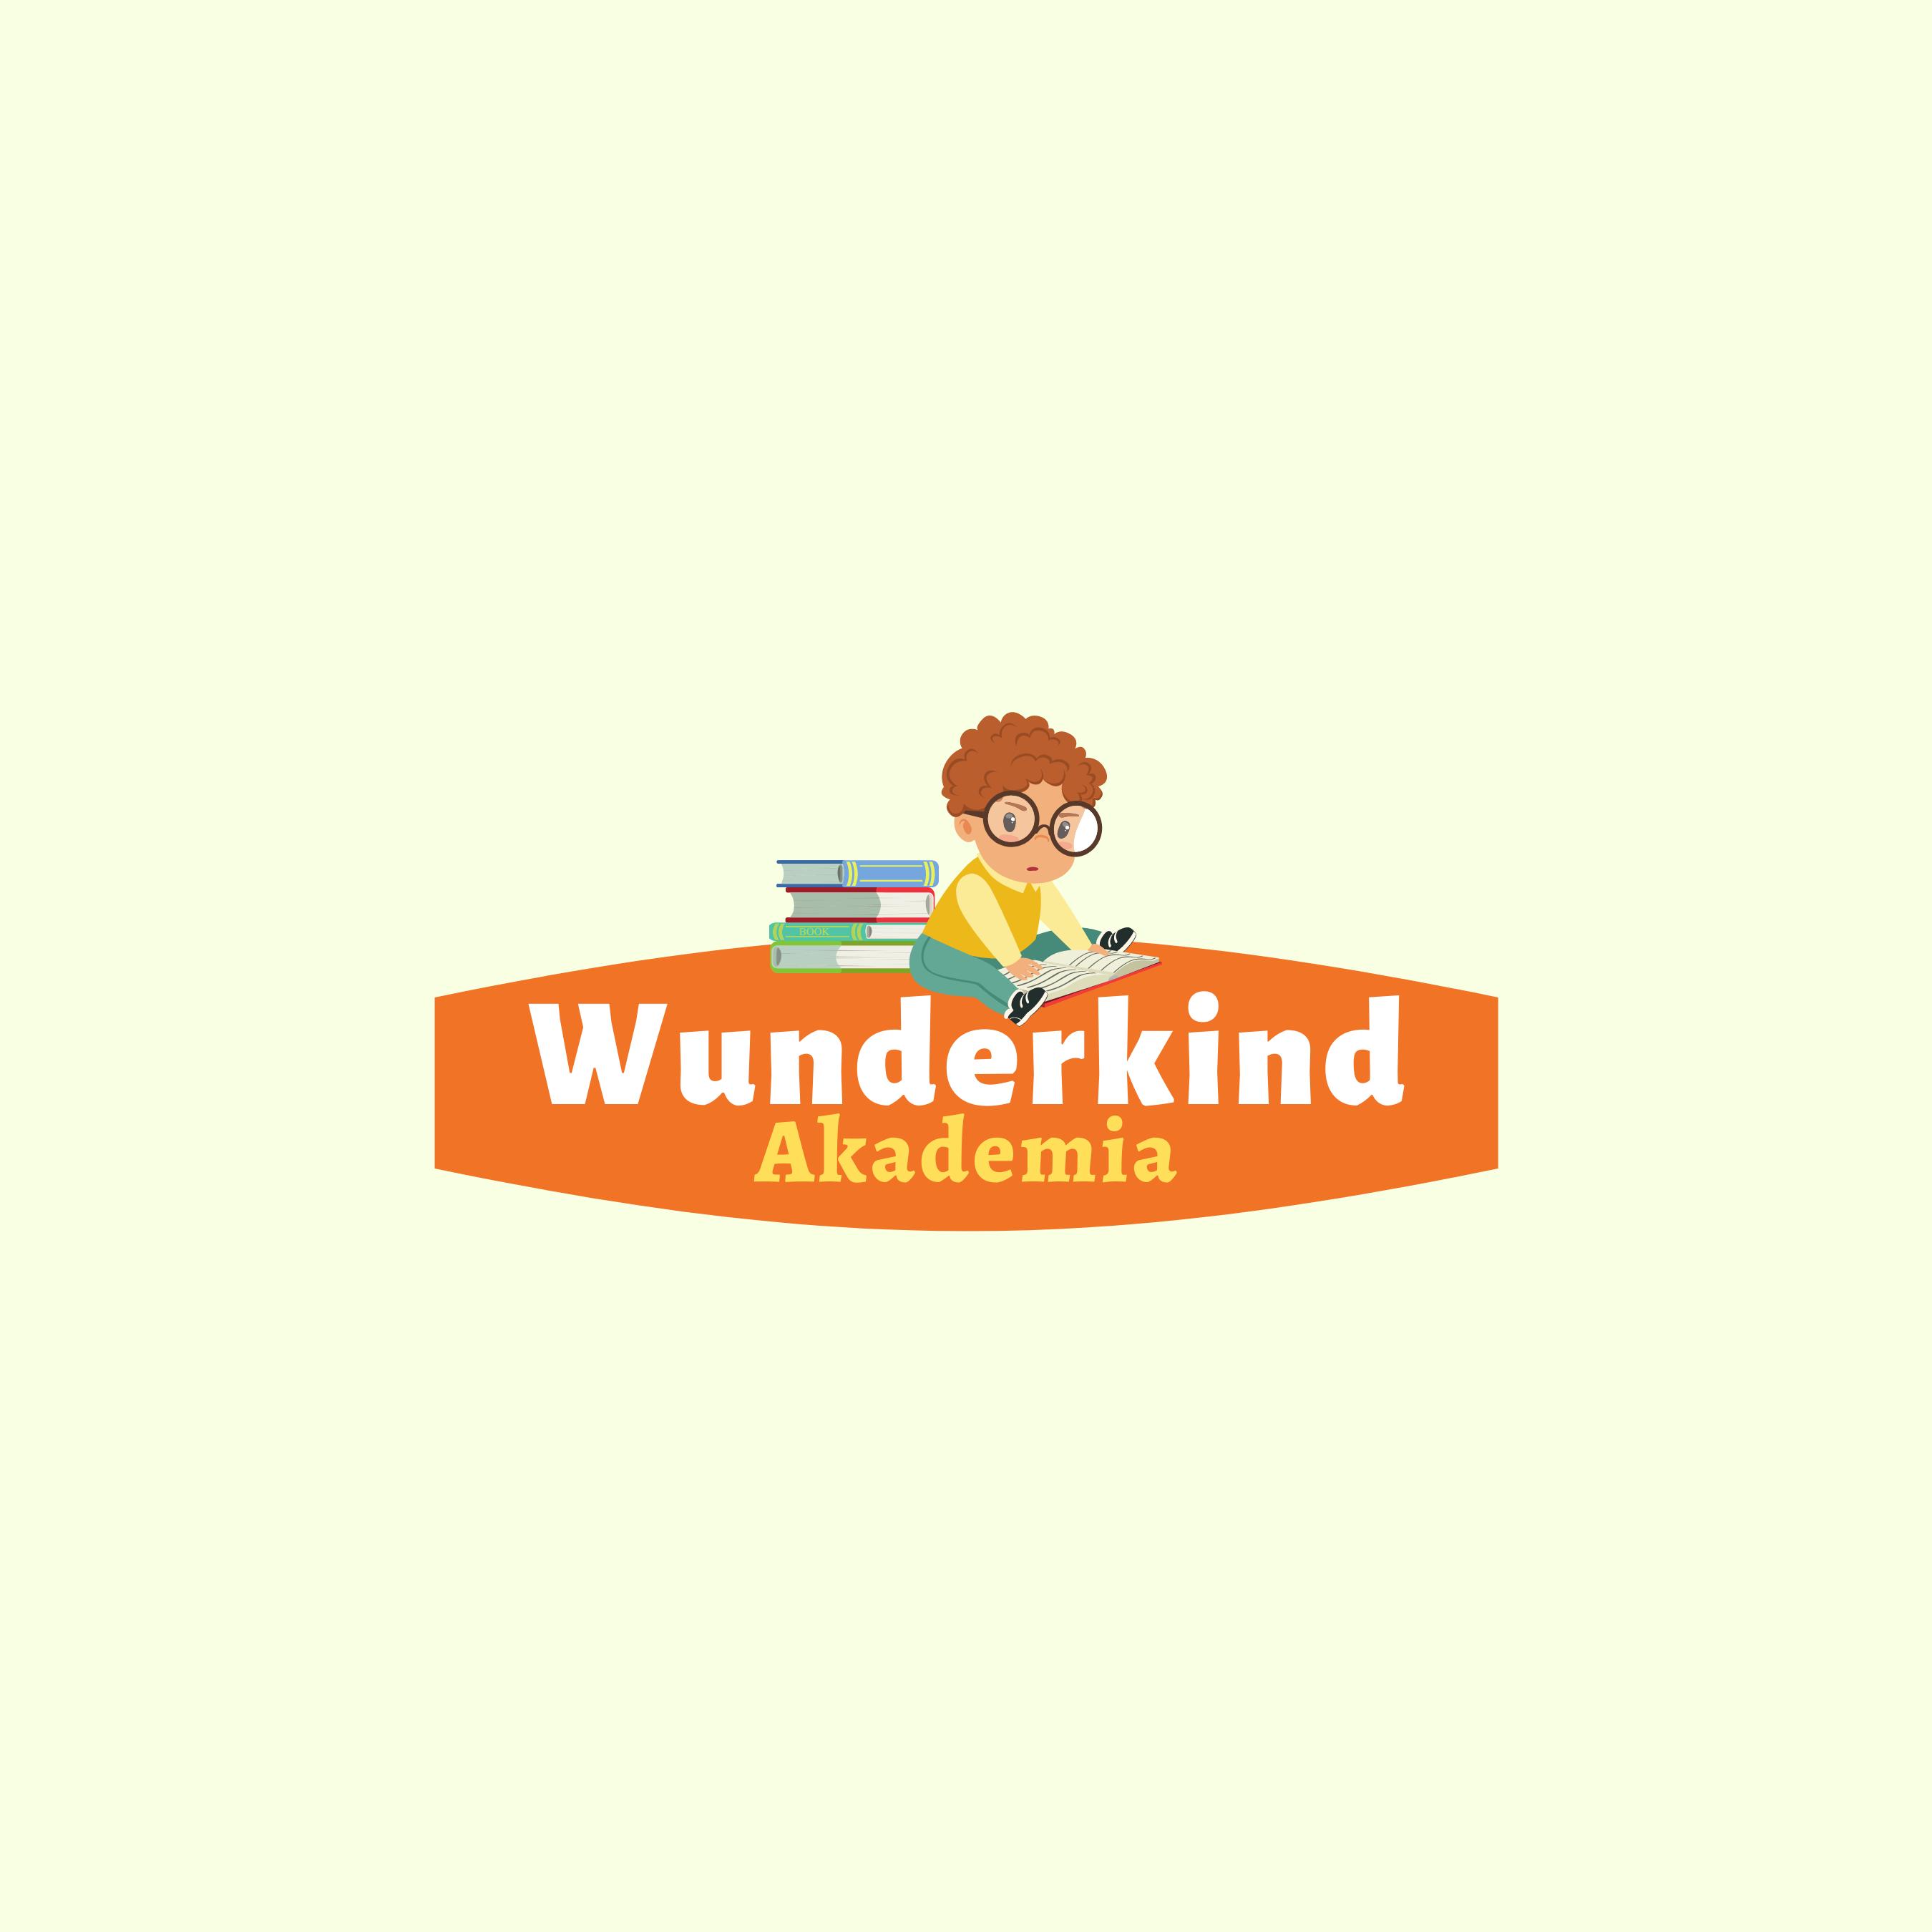 Wunderkind Akademia